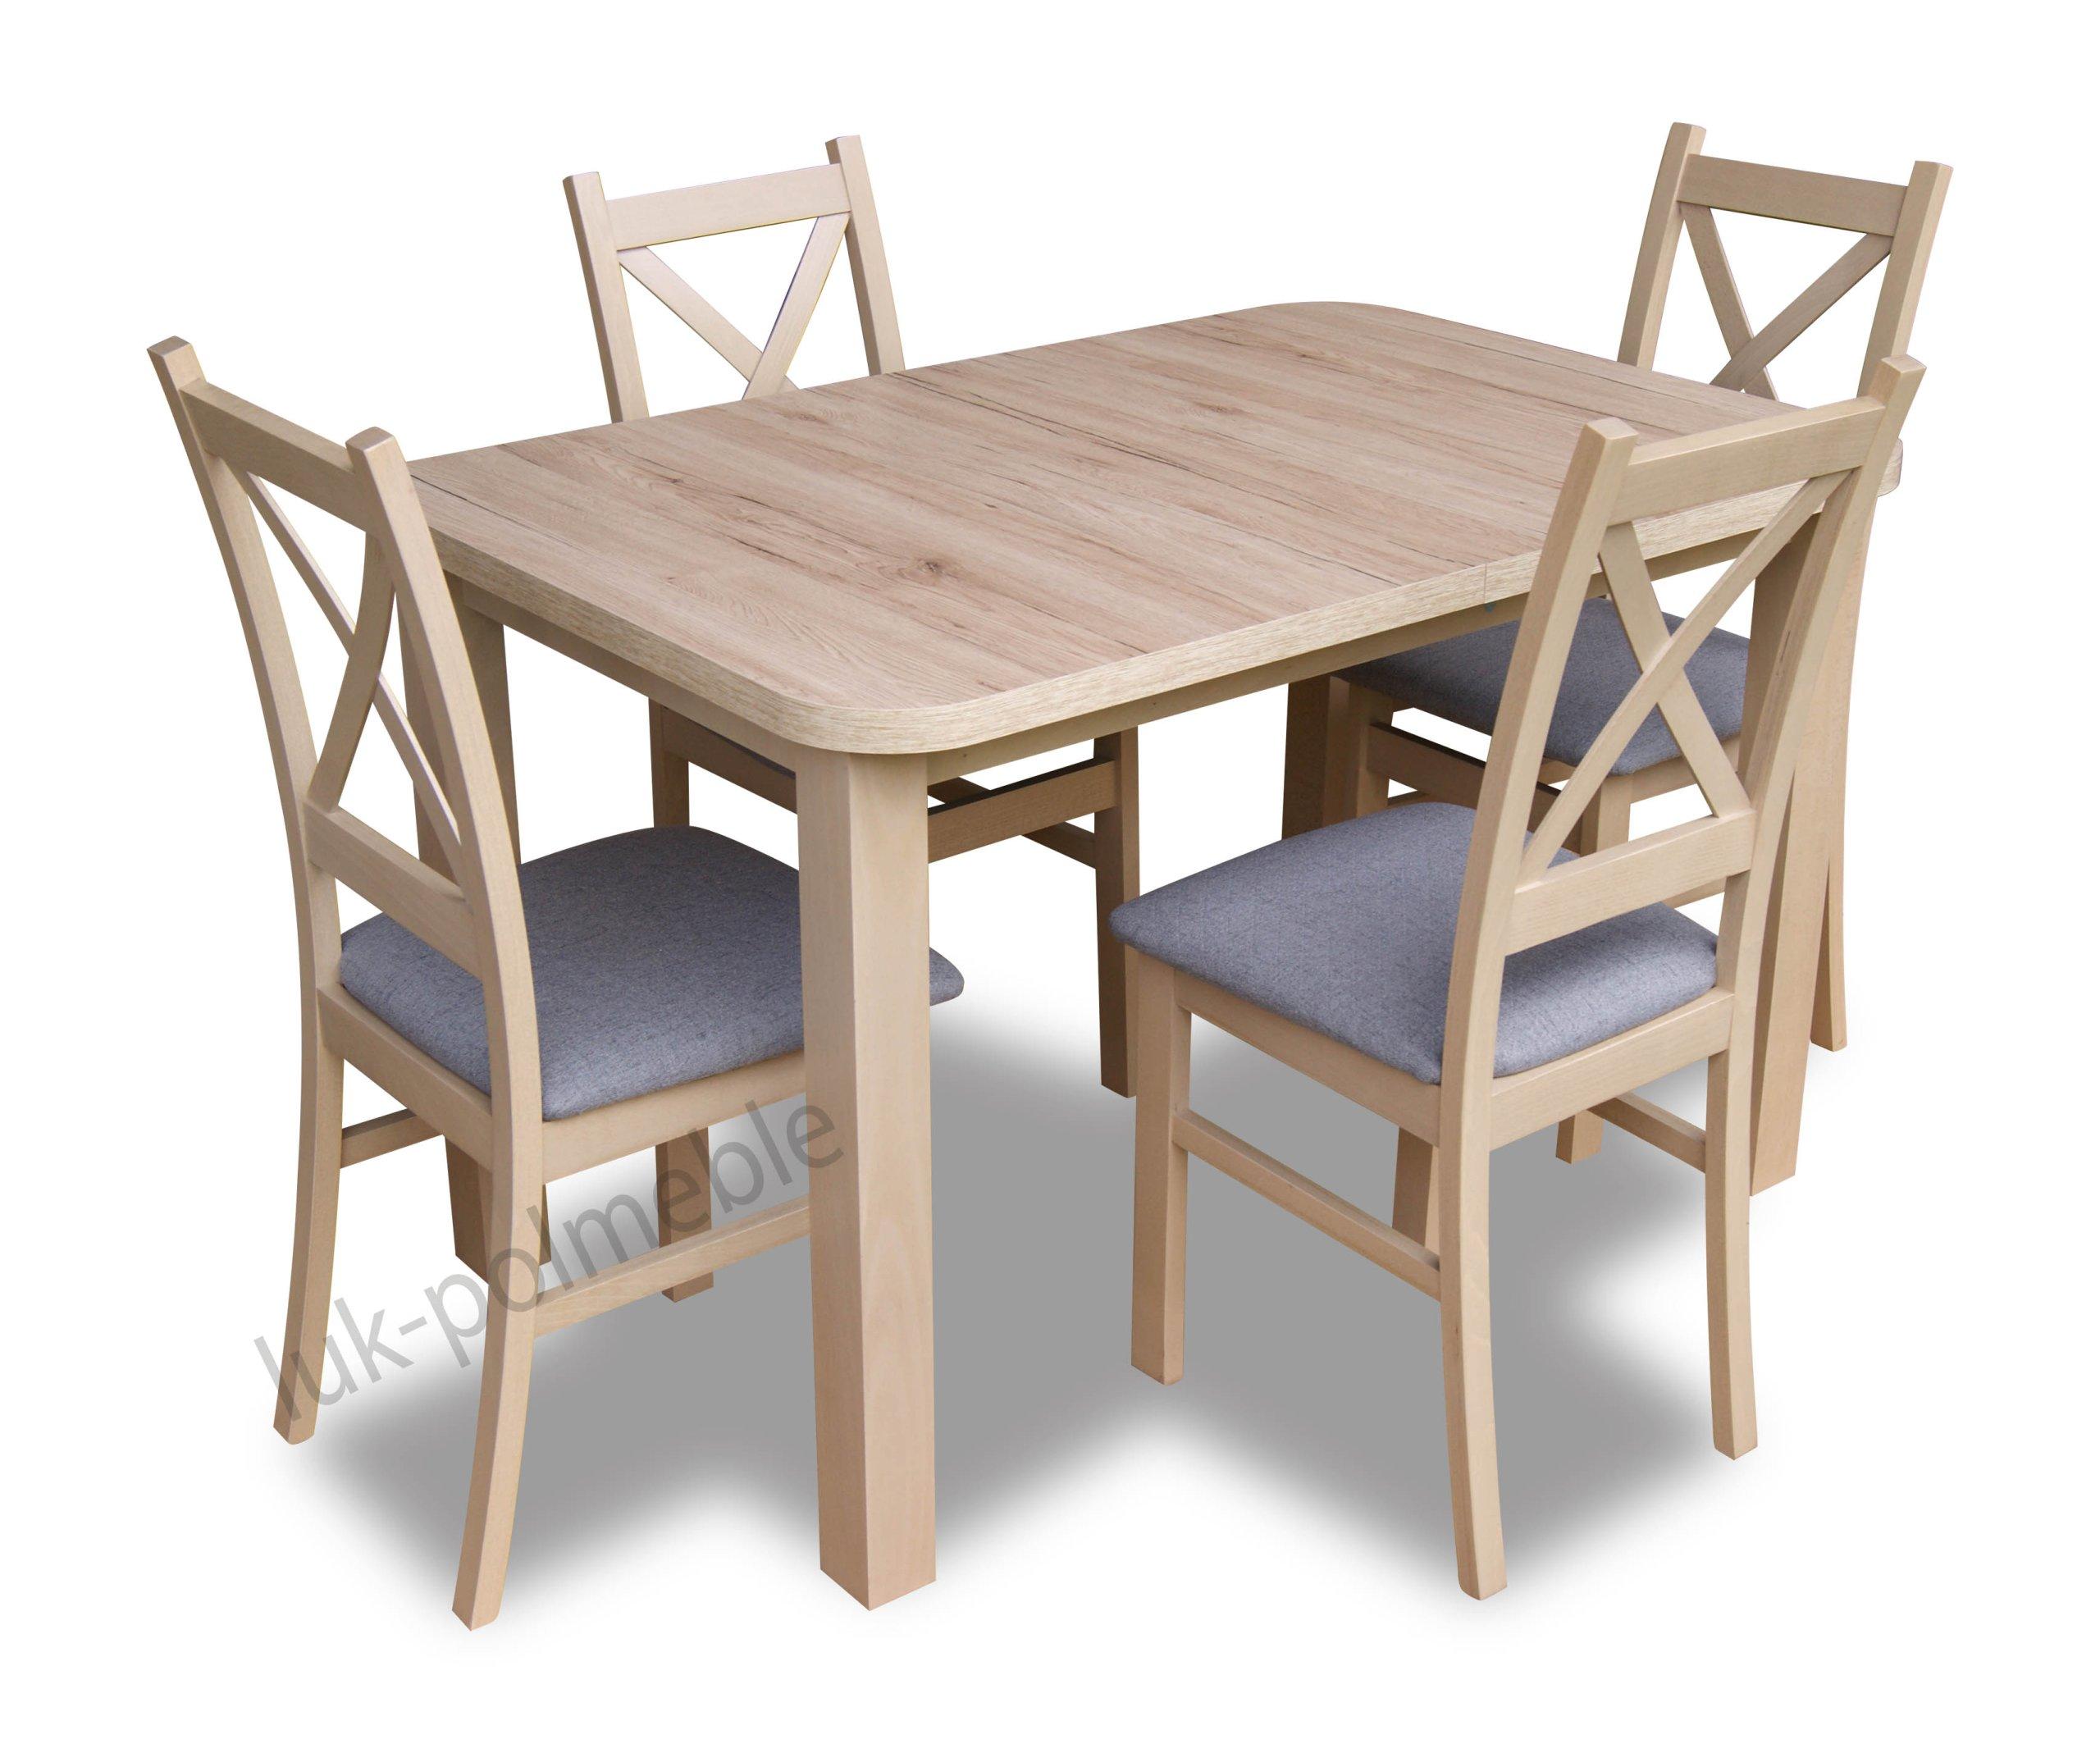 Stół 4 Krzesła Dąb San Remo Super Cena Sprawdź